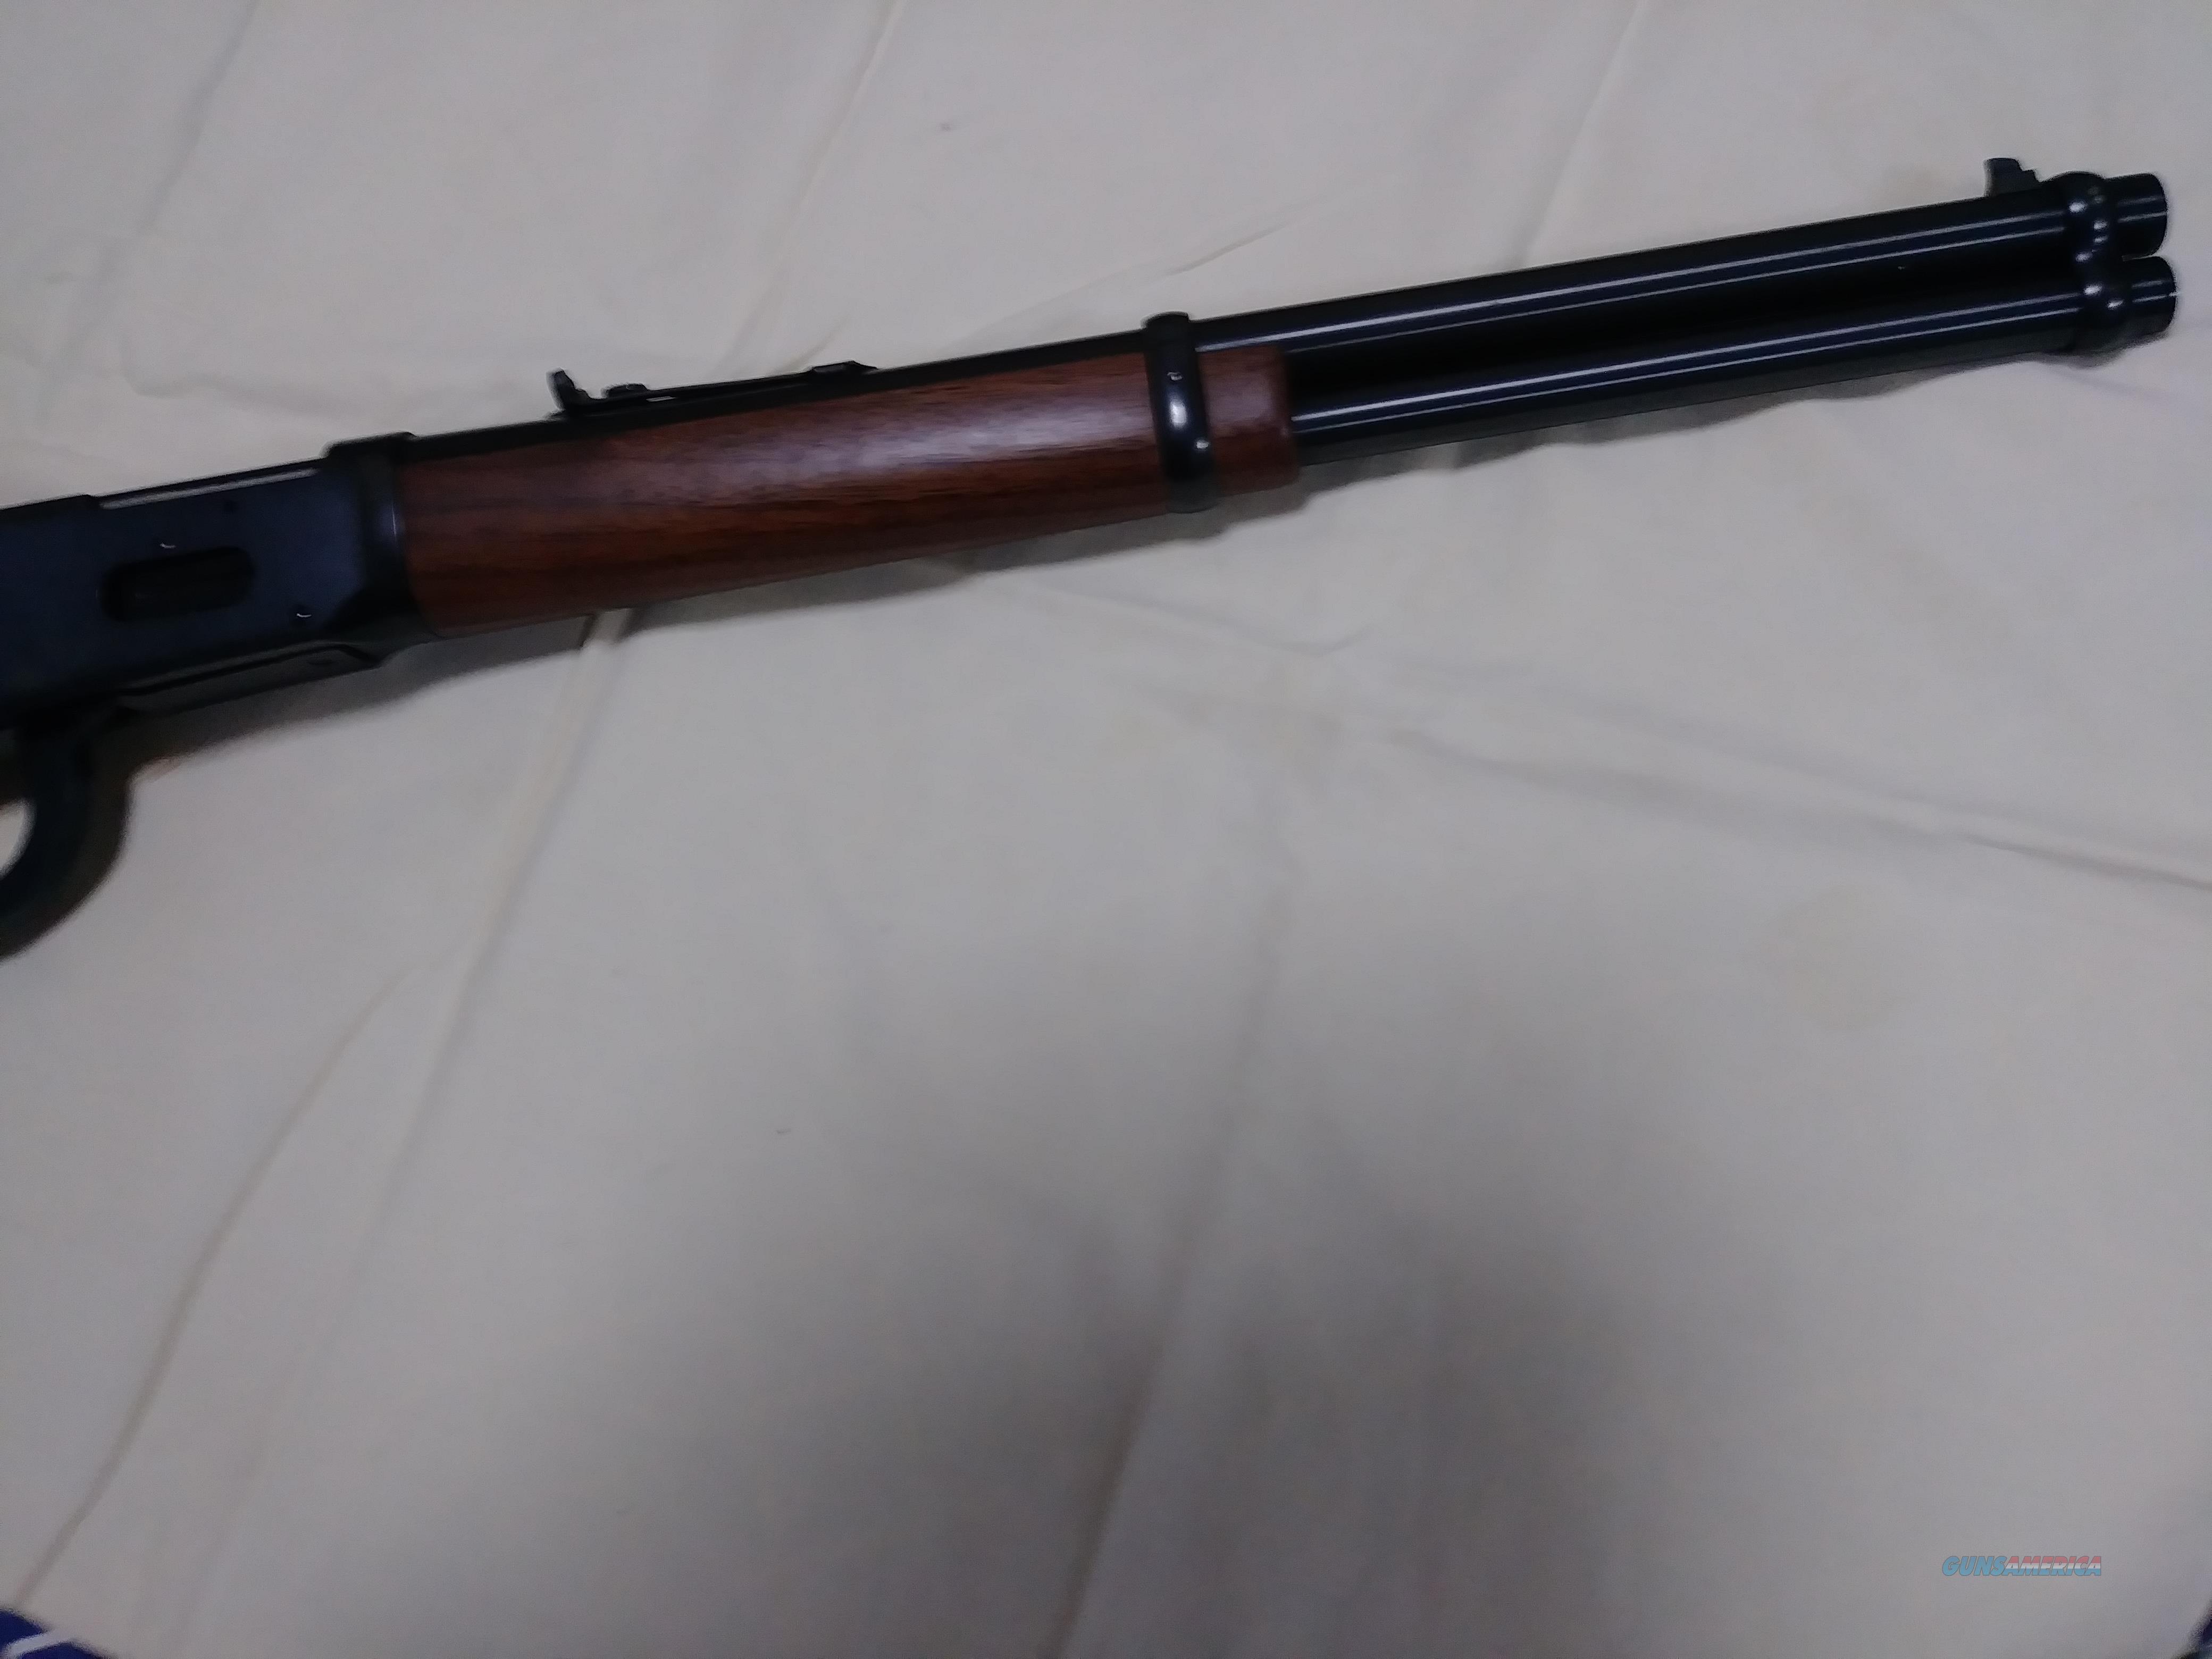 Winchester carbine model 94 45 colt AE  Guns > Rifles > Winchester Rifles - Modern Lever > Model 94 > Post-64